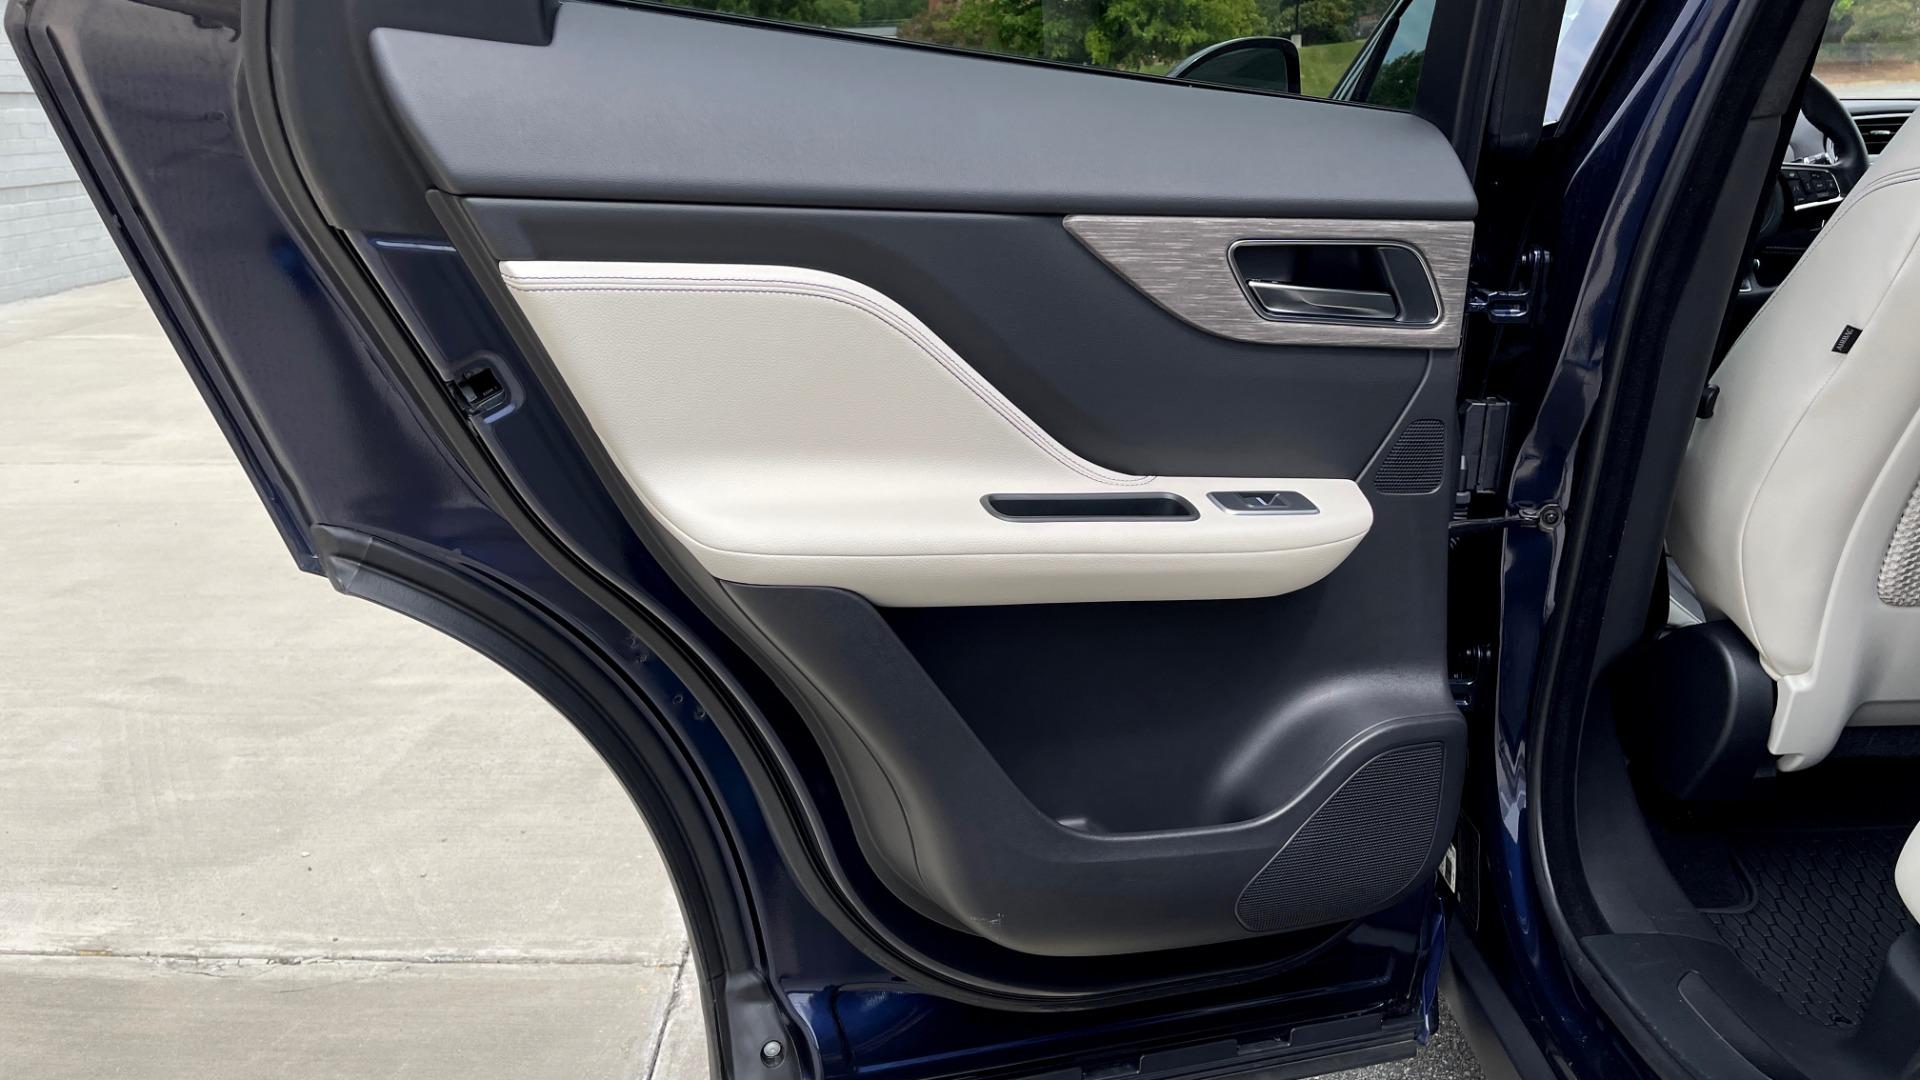 Used 2019 Jaguar F-PACE S / DRIVE PKG / BSA / HUD / BLACK EXT PKG / REARVIEW for sale $50,995 at Formula Imports in Charlotte NC 28227 48